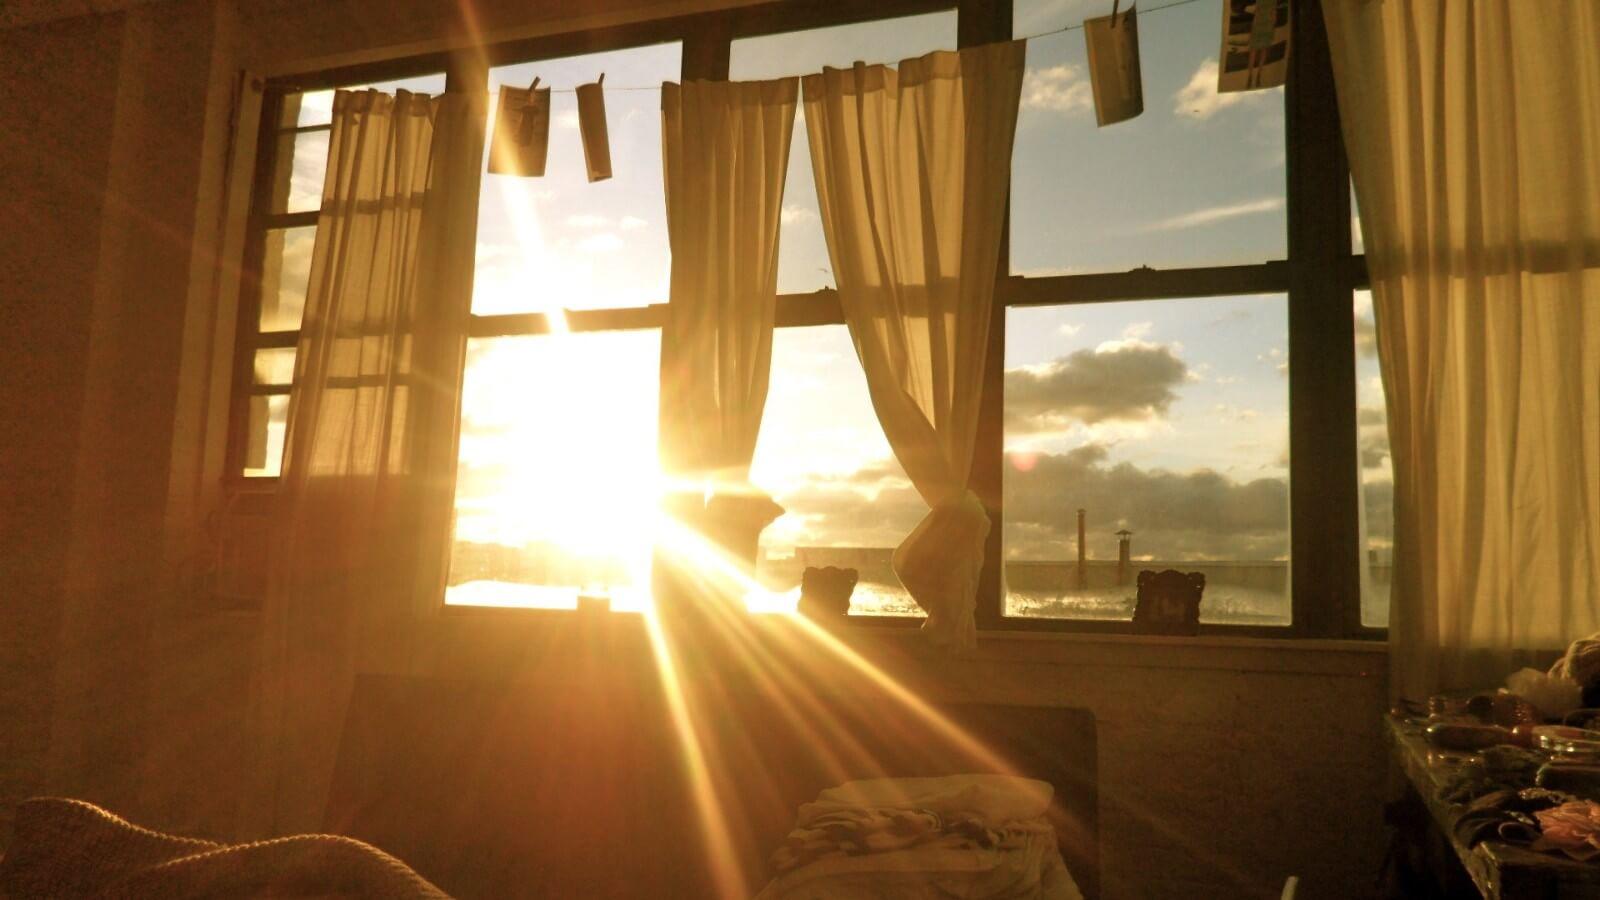 تاثیر پنجره نورگیر در مصرف انرژی